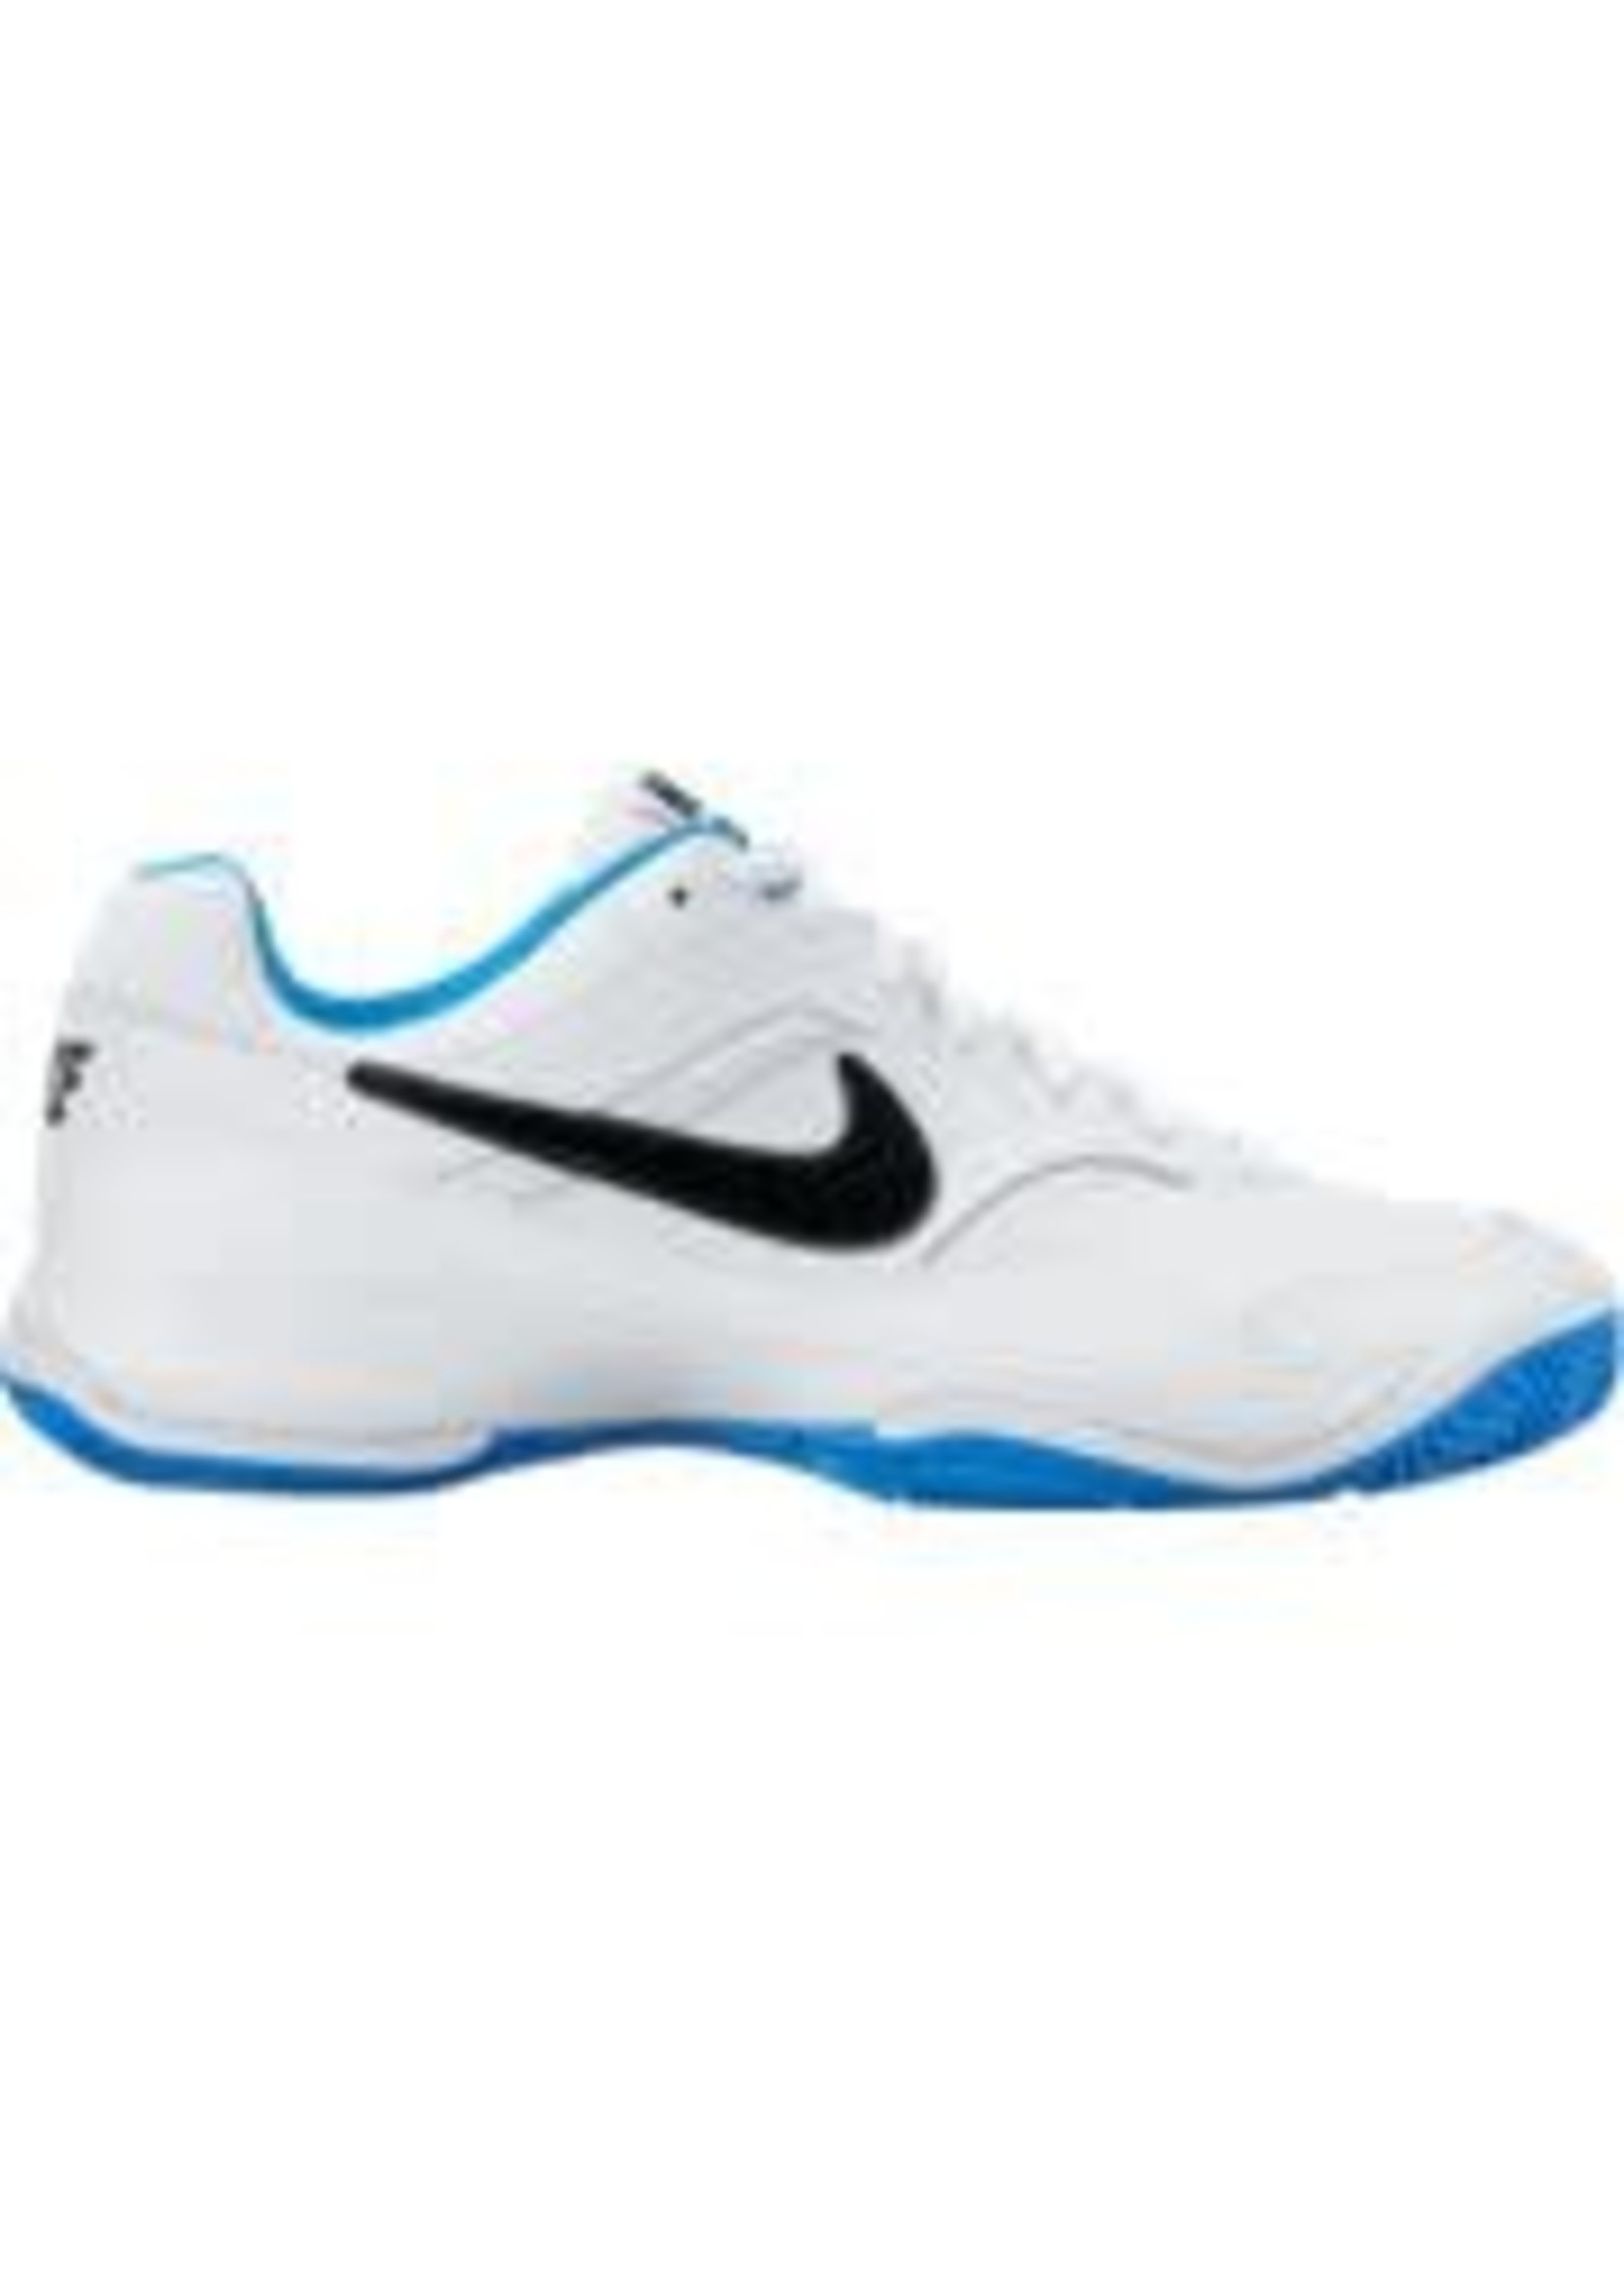 Nike Mens Court Lite Tennis Shoe White/Black/Blue 9